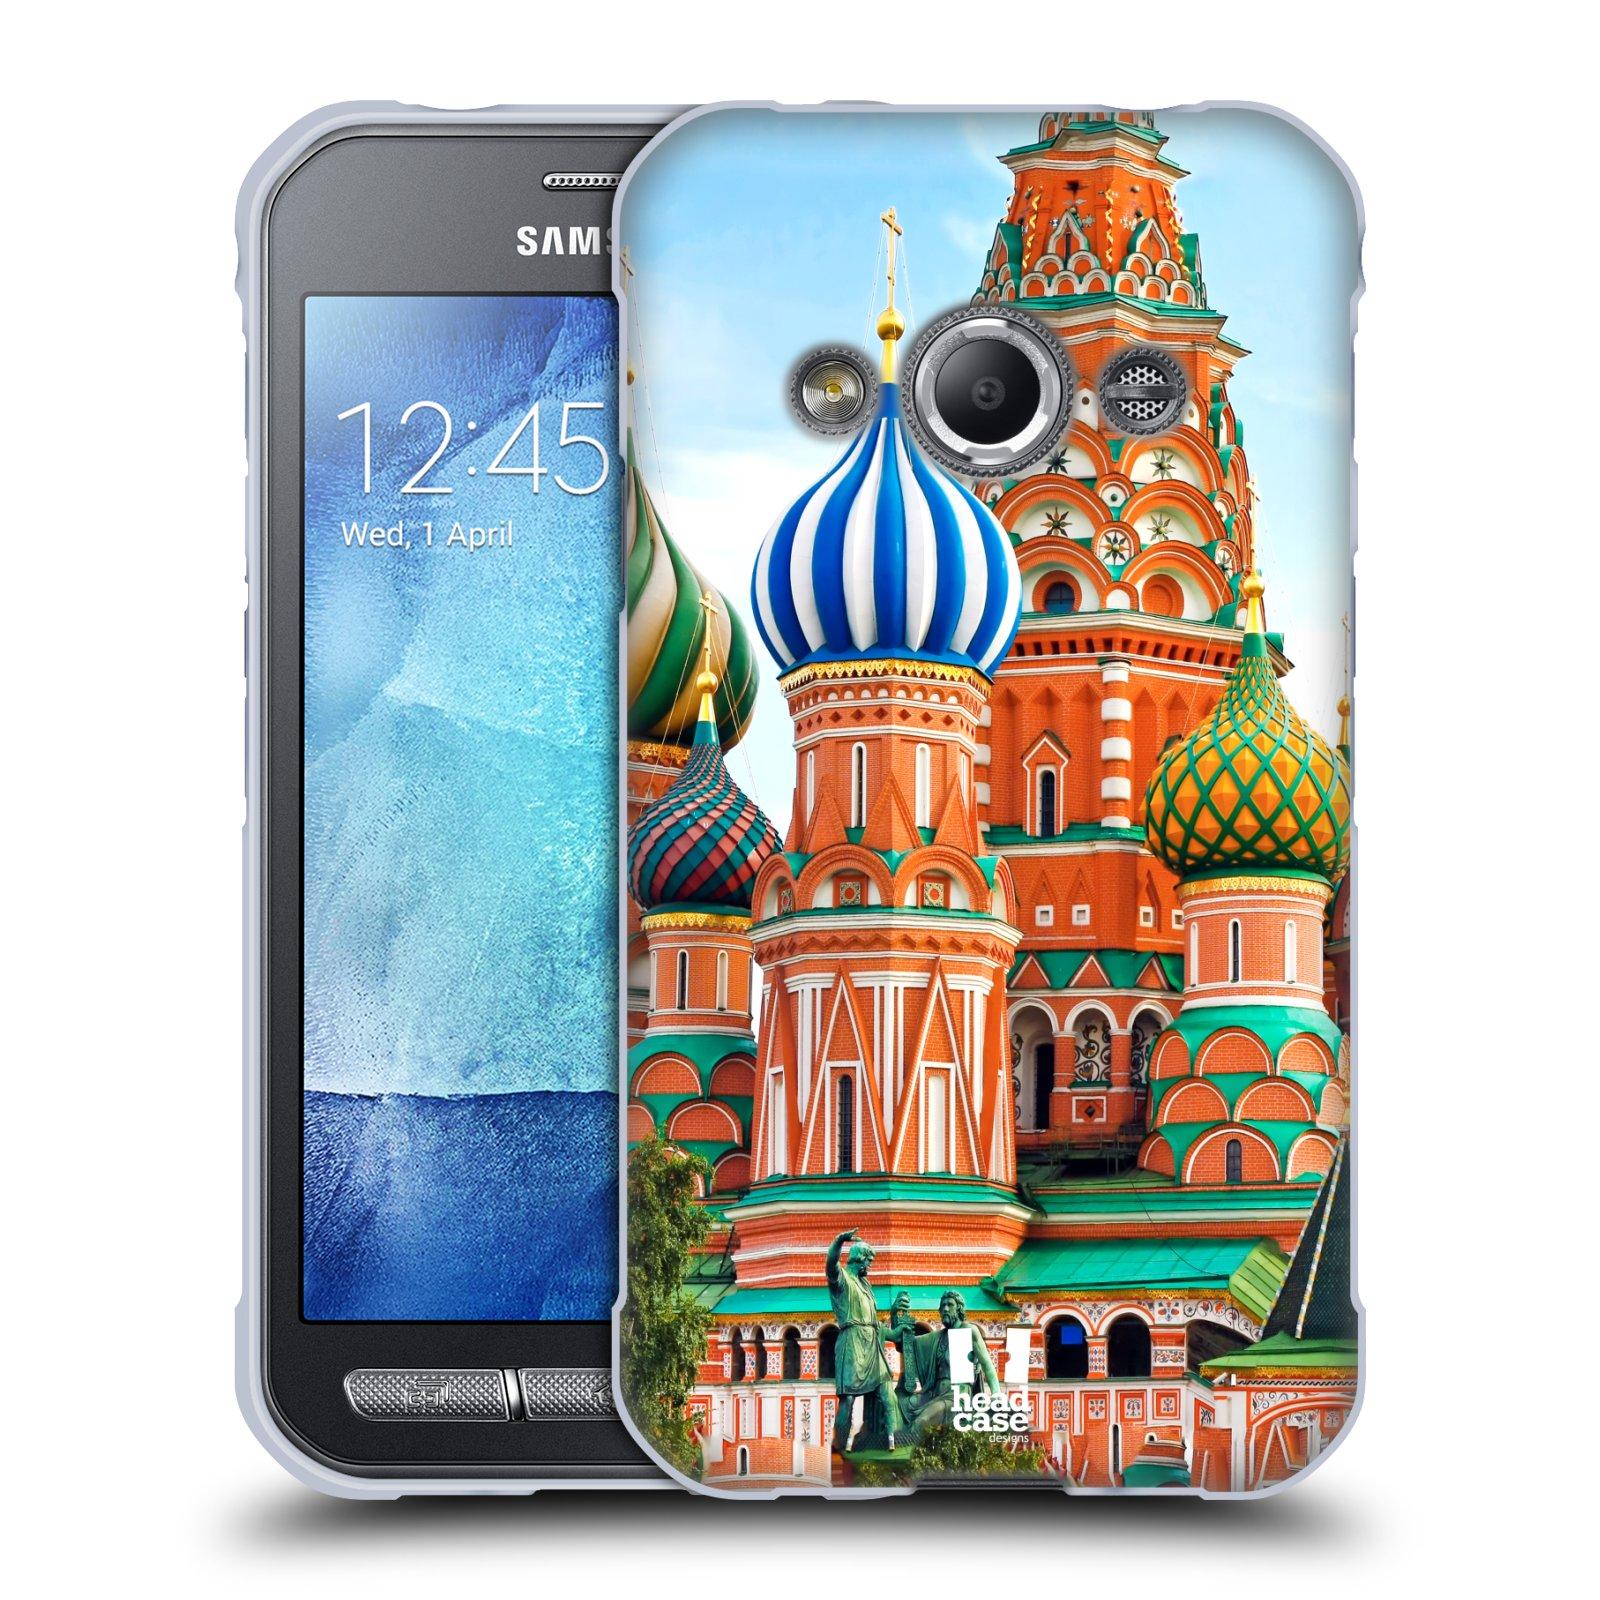 HEAD CASE silikonový obal na mobil Samsung Galaxy Xcover 3 vzor Města foto náměstí RUSKO,MOSKVA, RUDÉ NÁMĚSTÍ